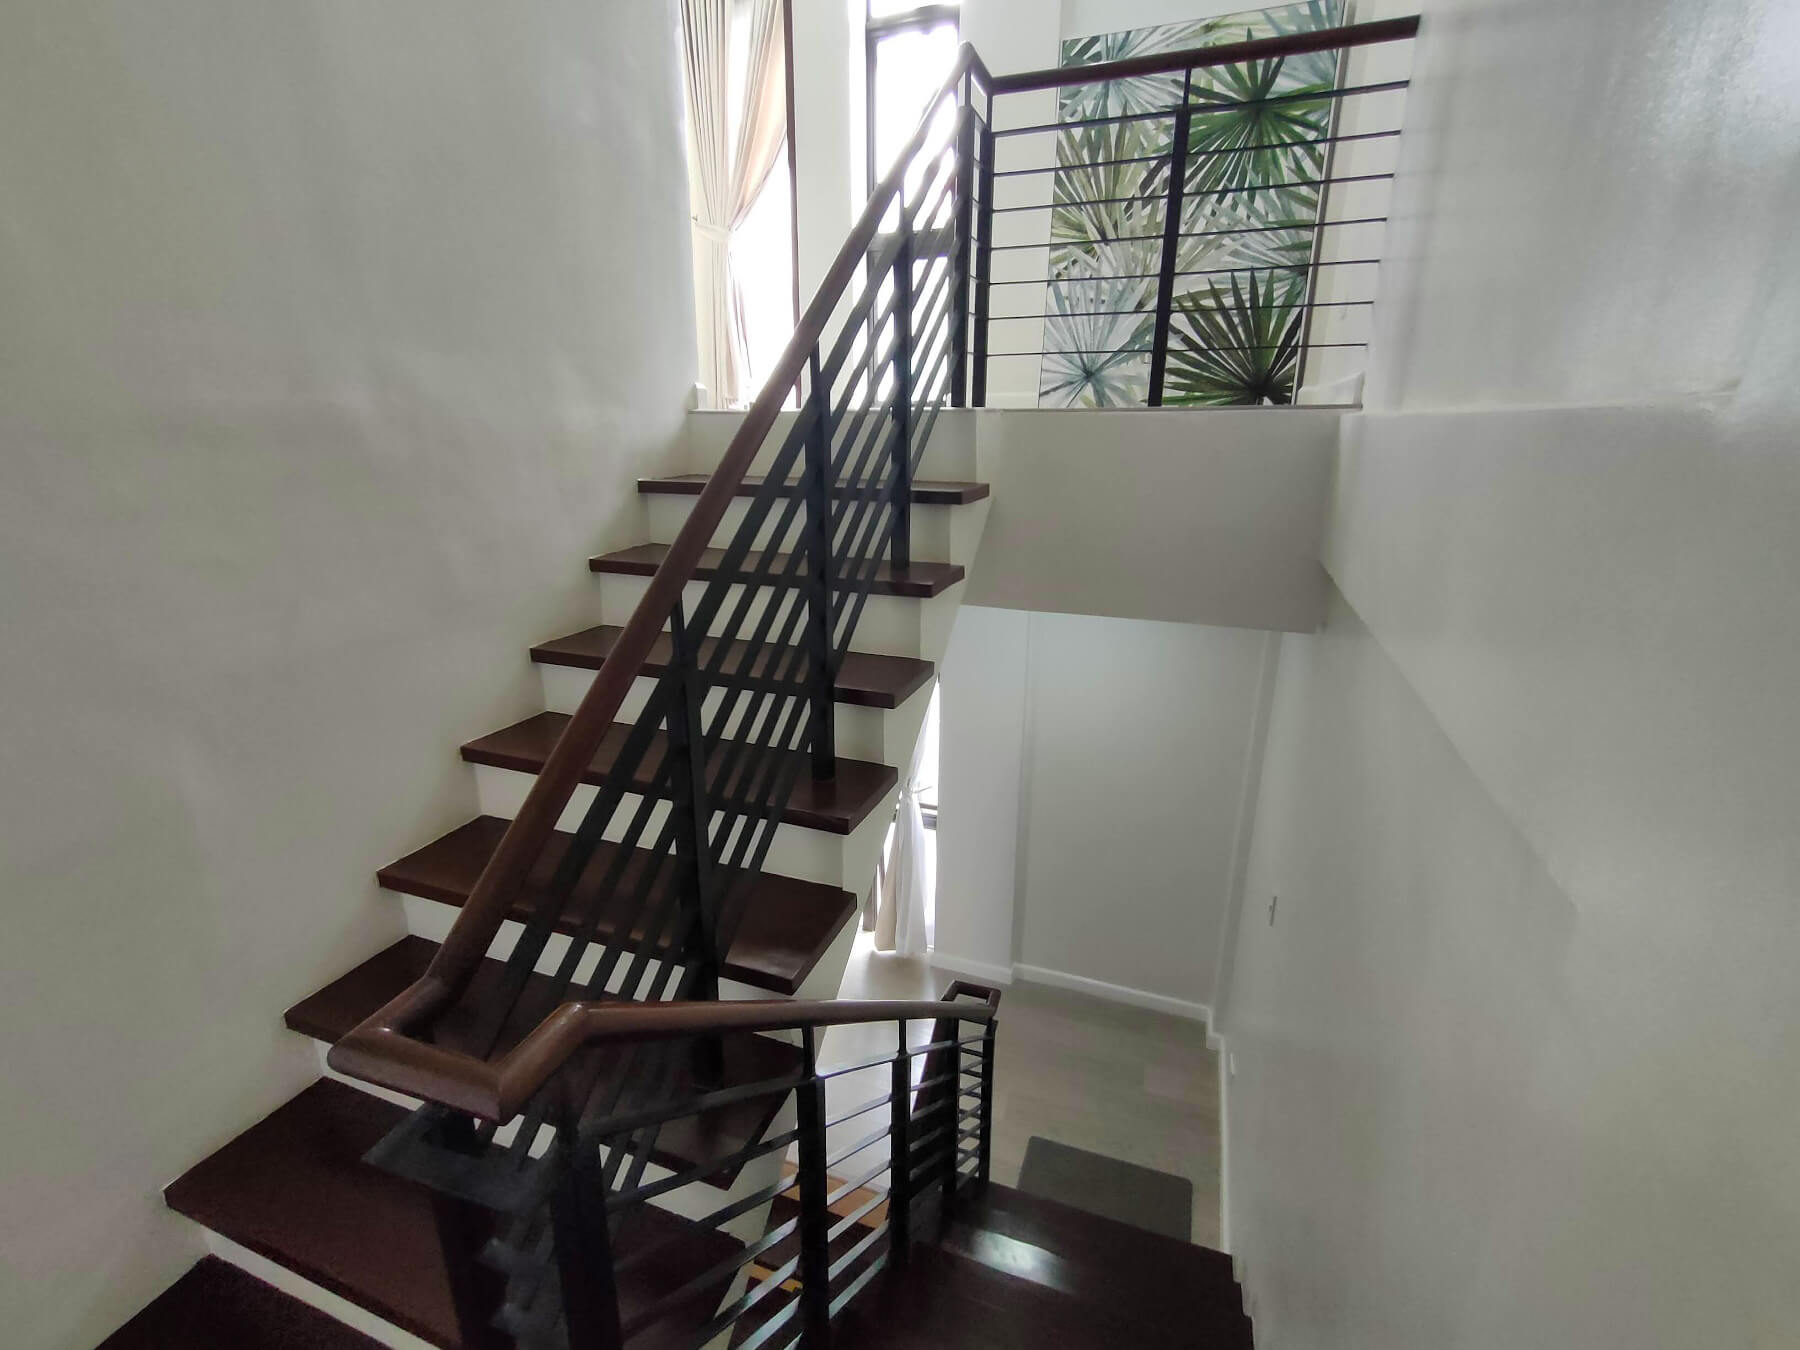 Brizlane Residences - Stairs to Third floor